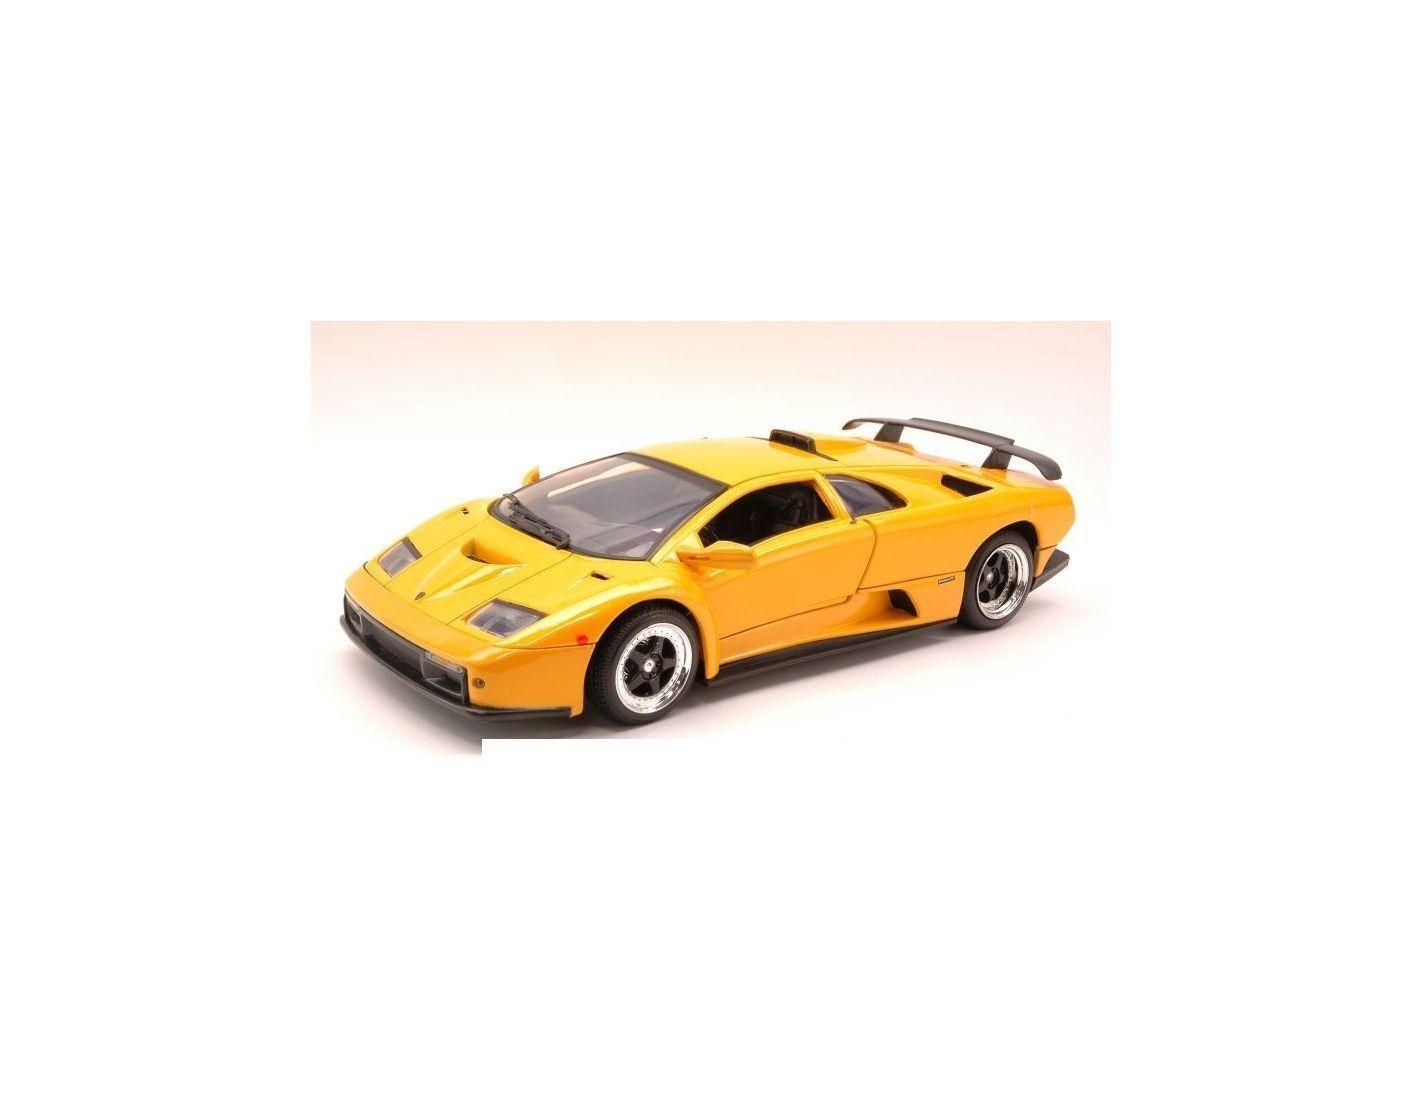 Lamborghini Diablo Gt 1999 Yellow 1 18 Modellino Motormax Mtm73168yl